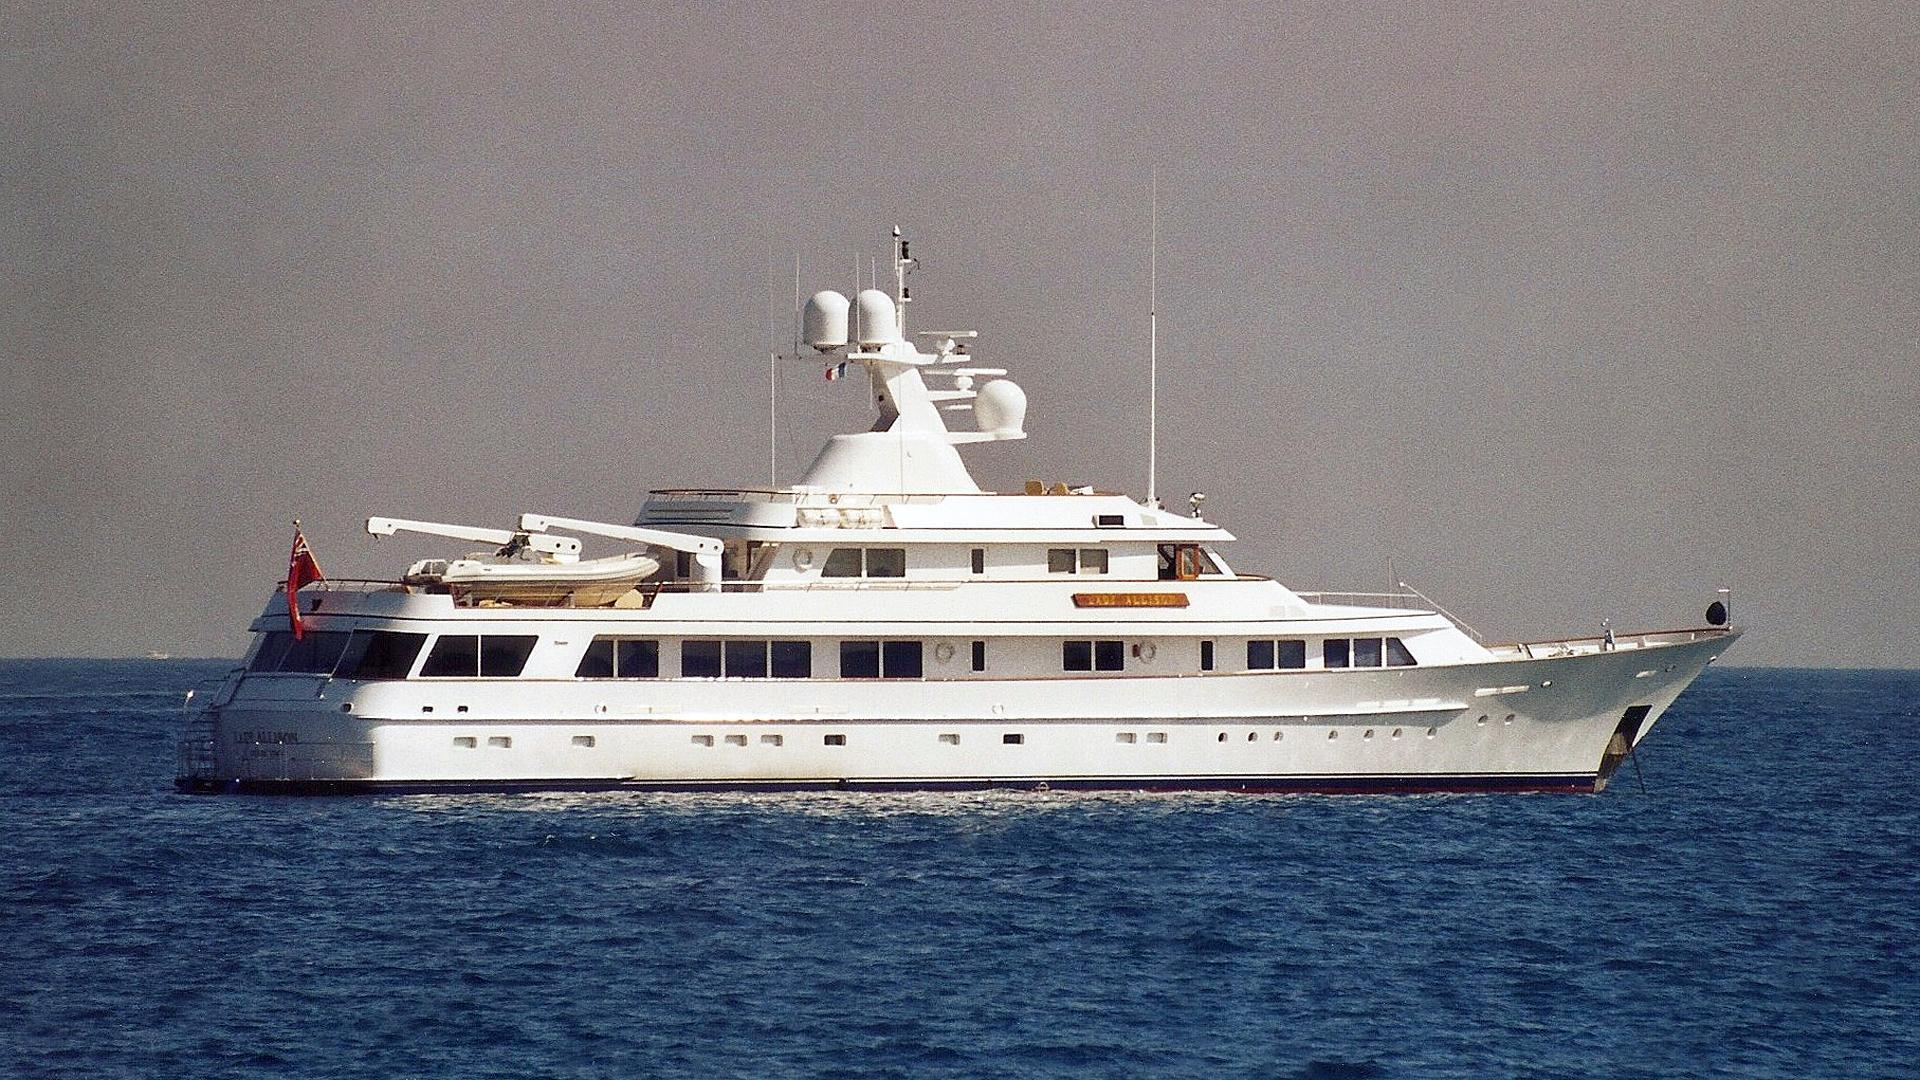 endless-summer-motor-yacht-feadship-1991-46m-profile